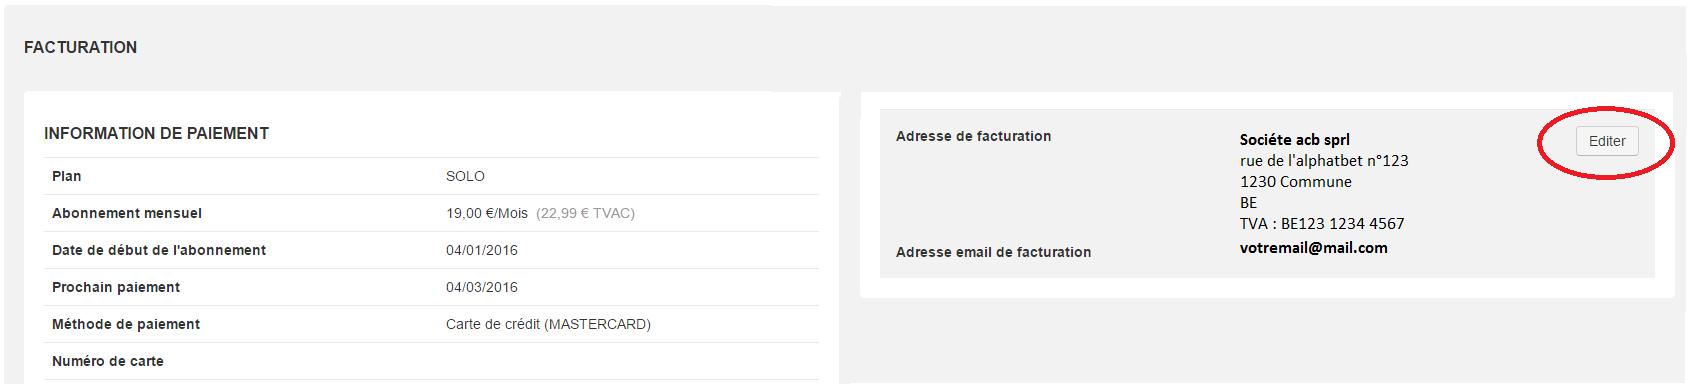 Smoall- Adresse facturation abonnement